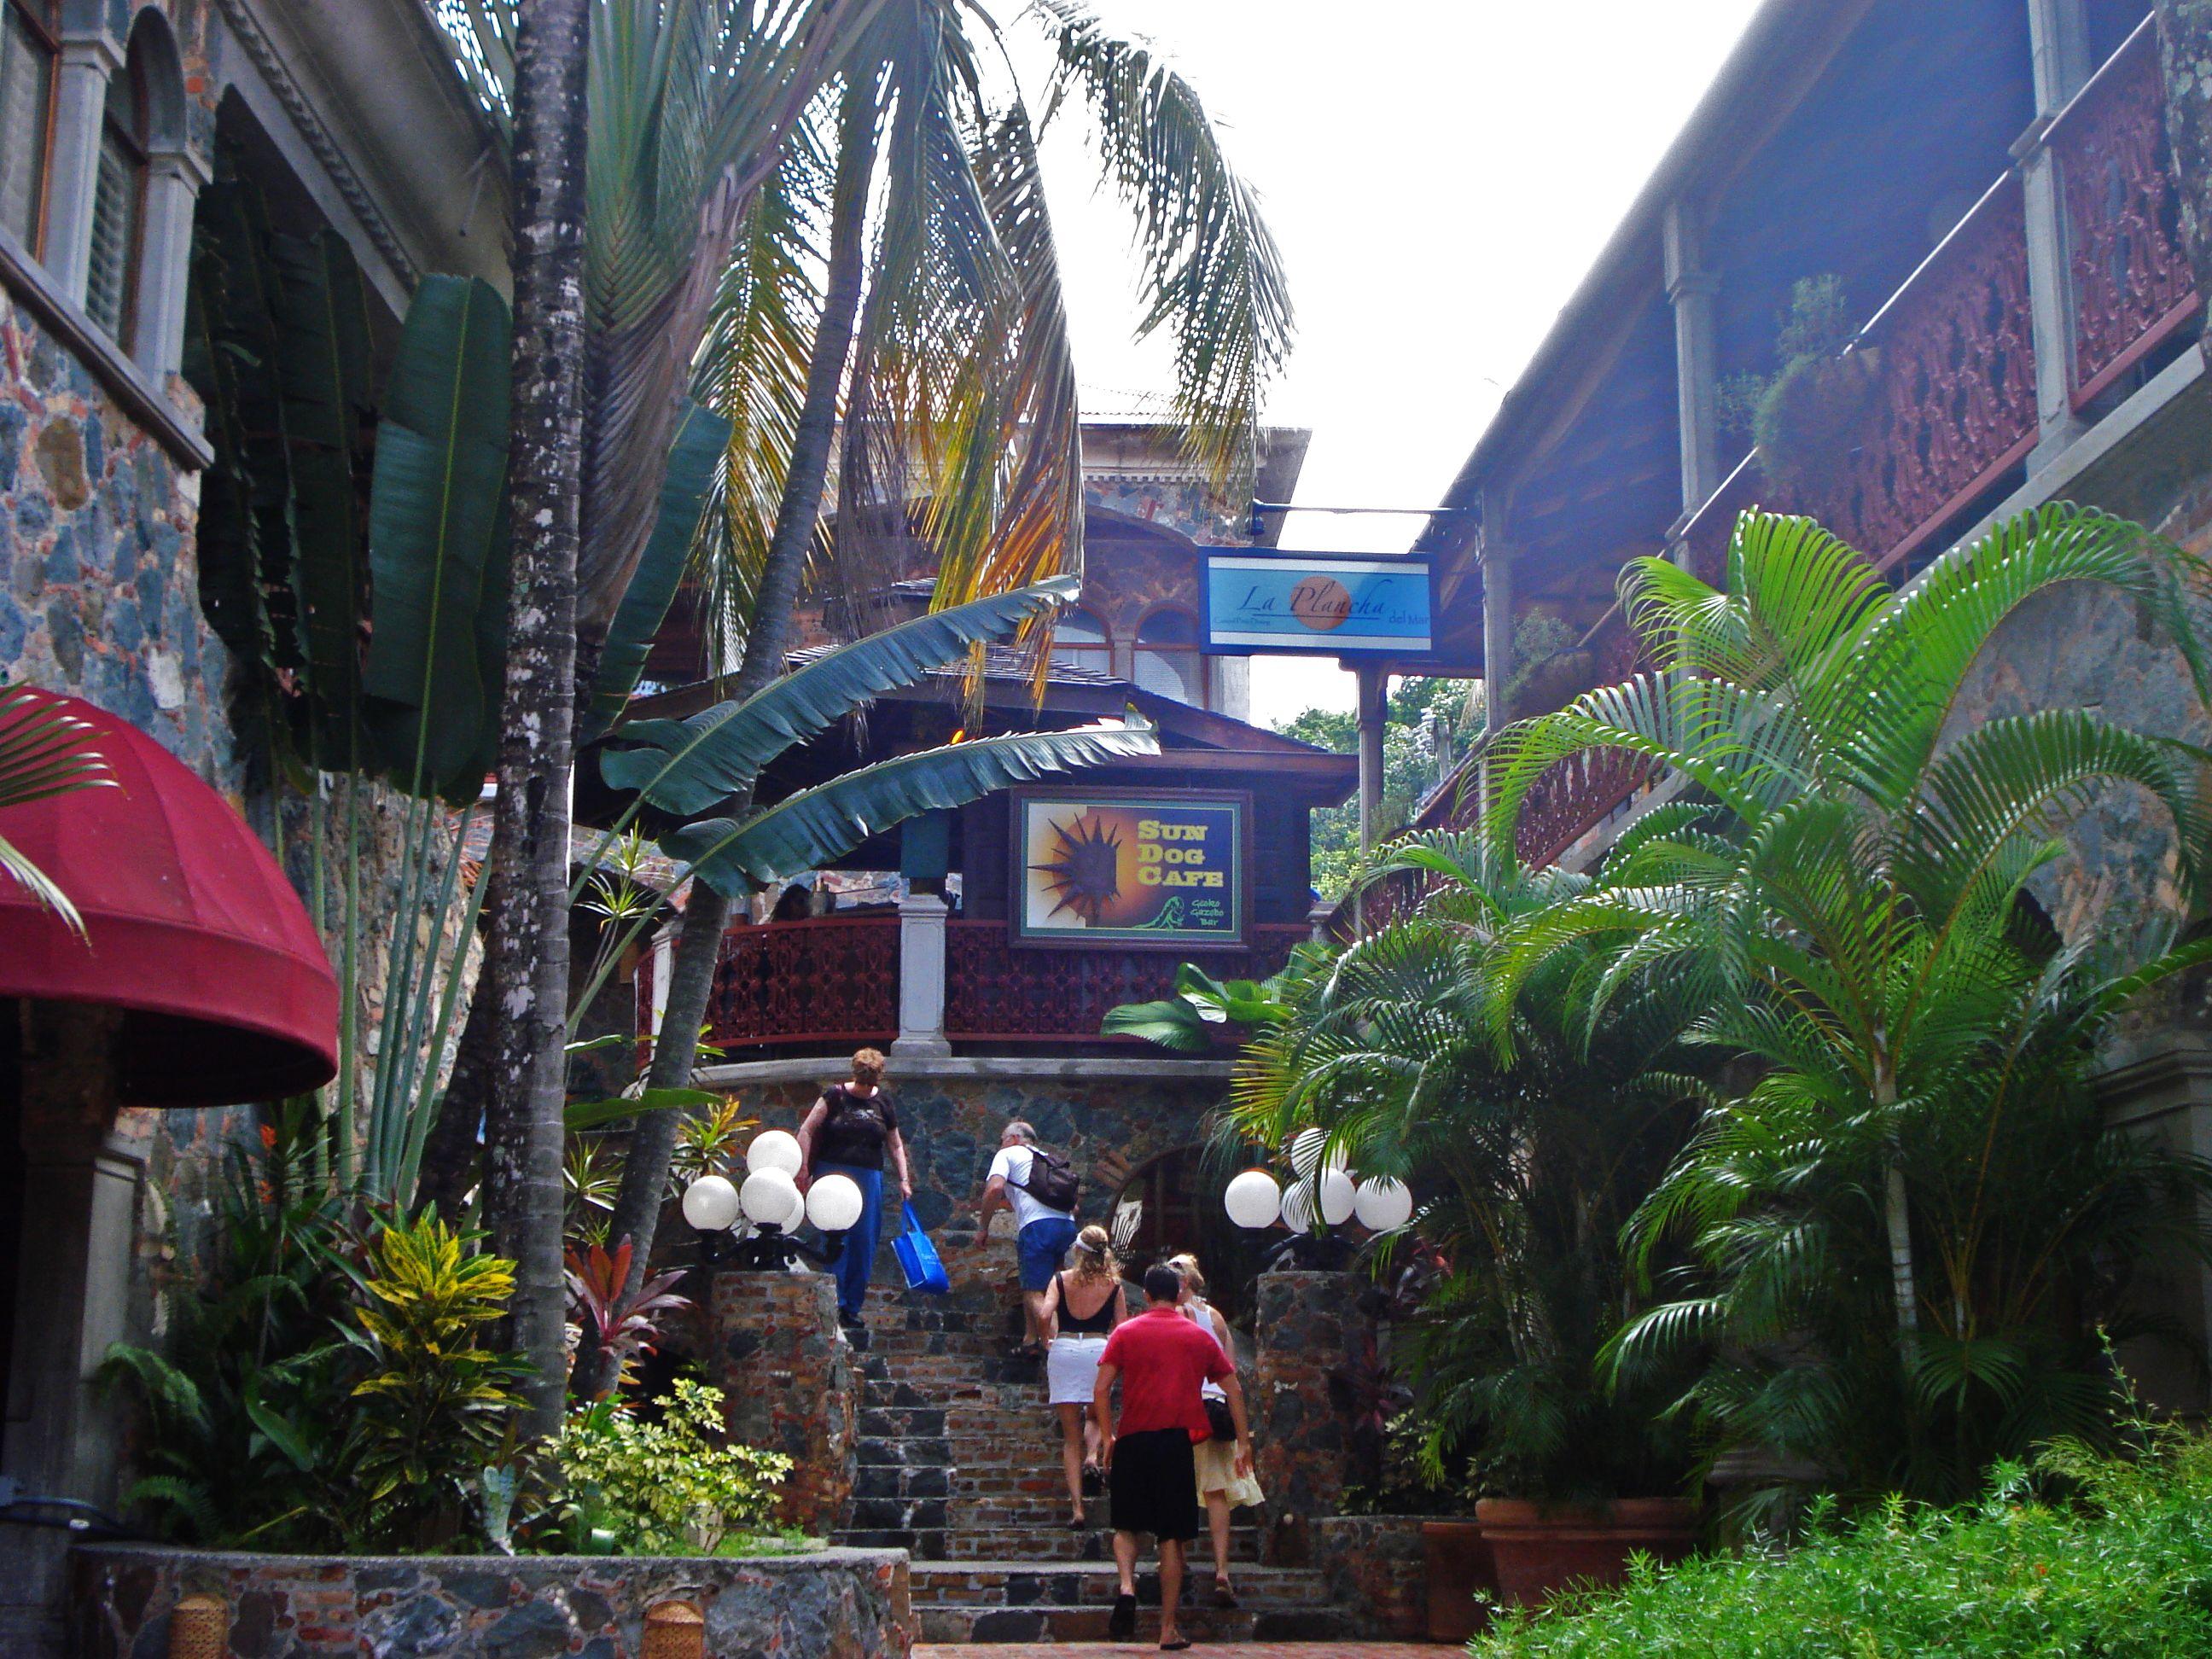 St John Virgin Islands Shopping Exploring The Shops And